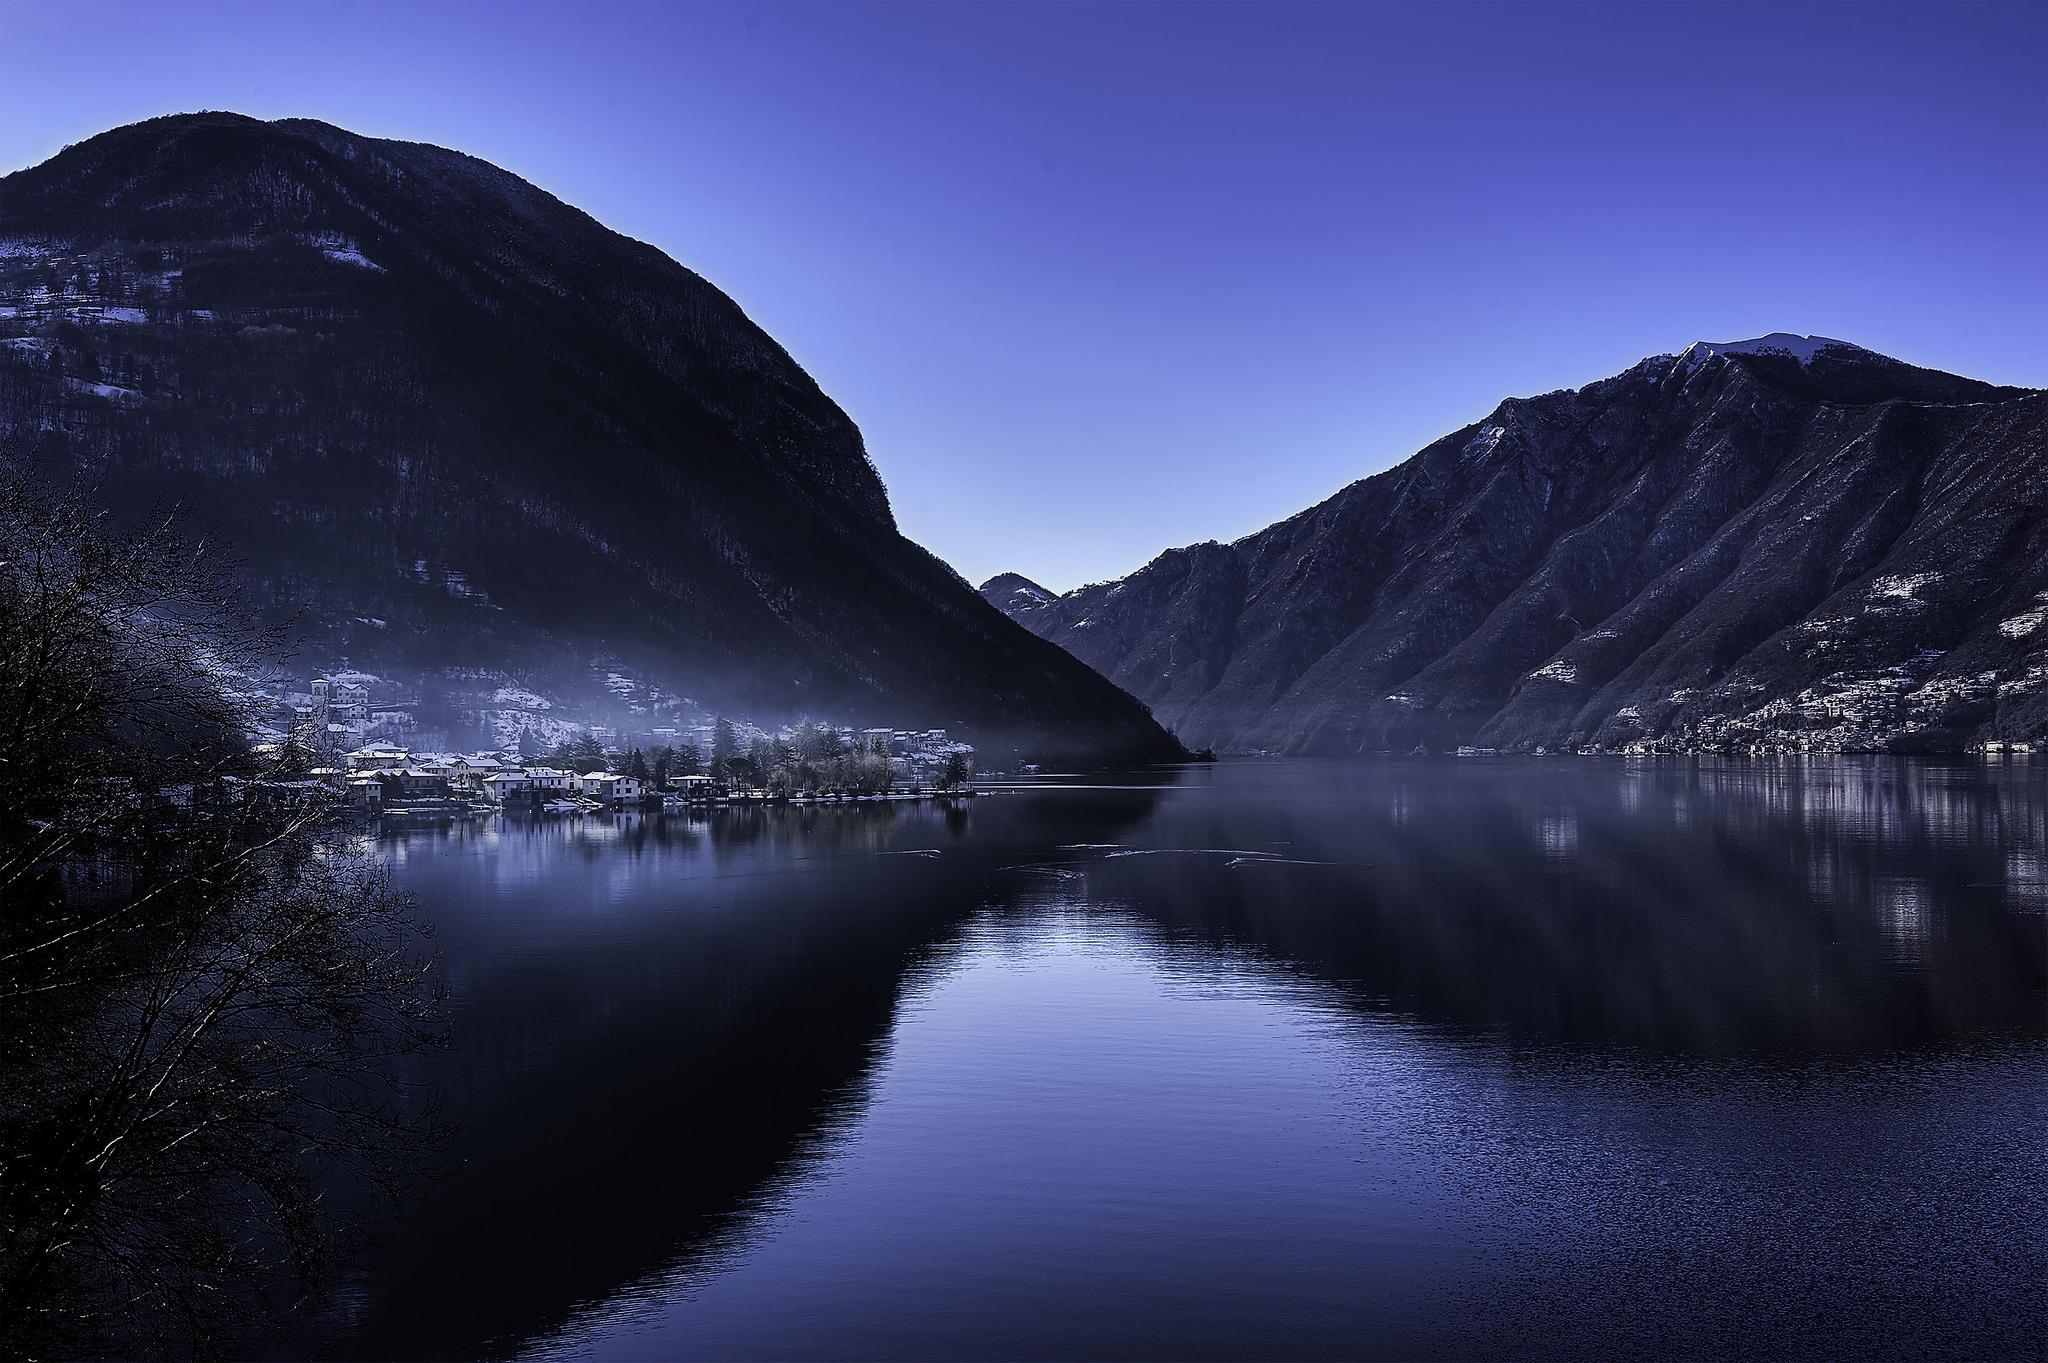 Лугано, Svizzera, Italia